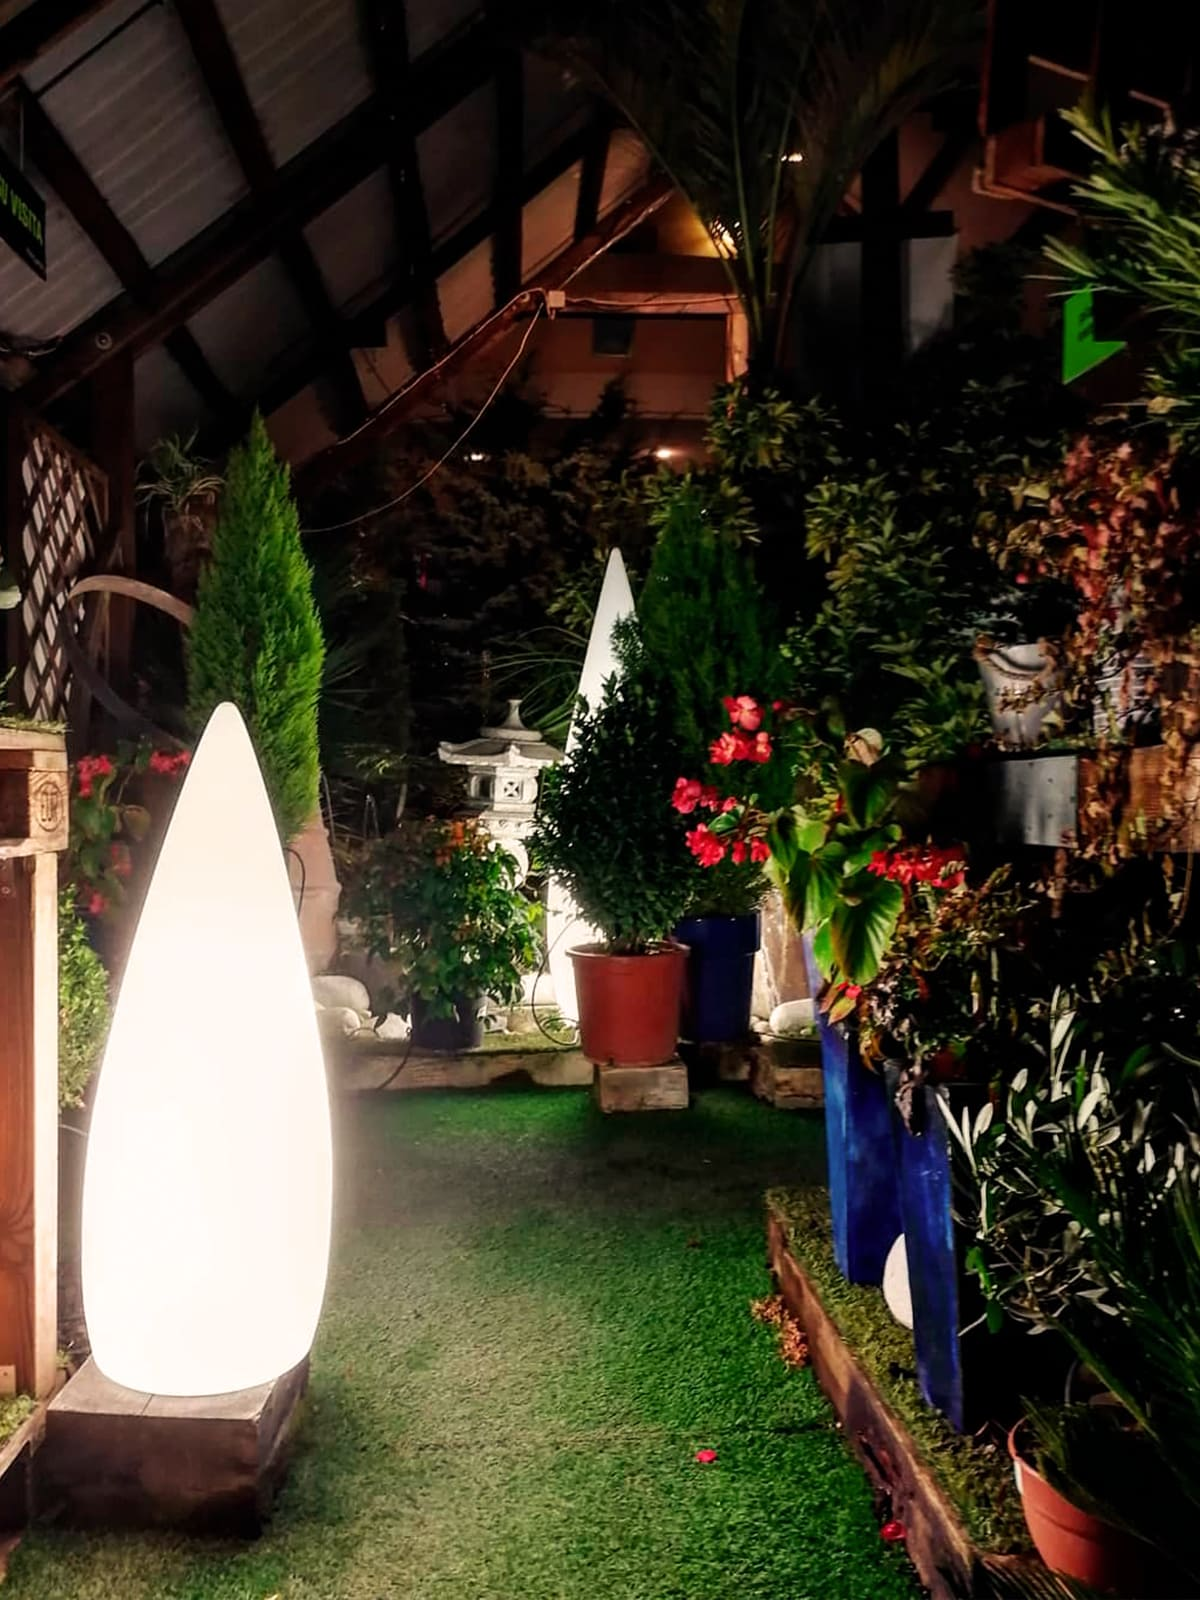 centro-jardineria-garden-invernadero-artesanal-madera-fuente-21_HIDROJARDIN-Bañeres